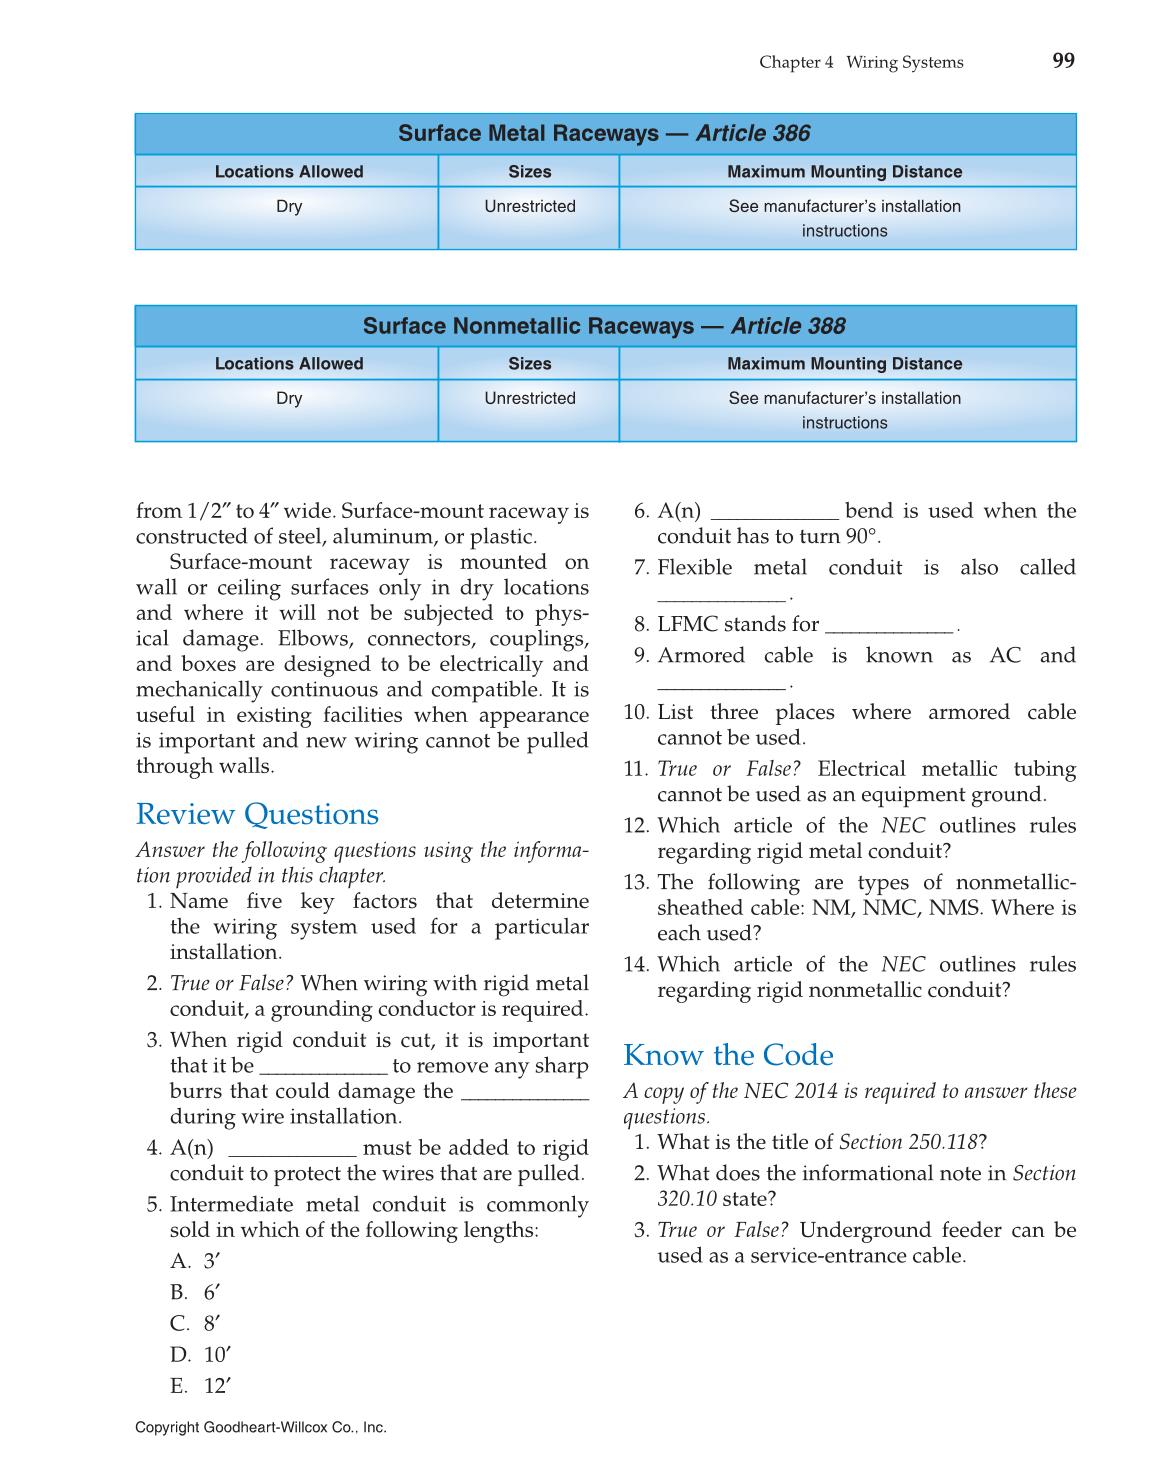 printable modern residential wiring 10th edition page 99 rh g wonlinetextbooks com modern residential wiring 2014 modern residential wiring 11 edition